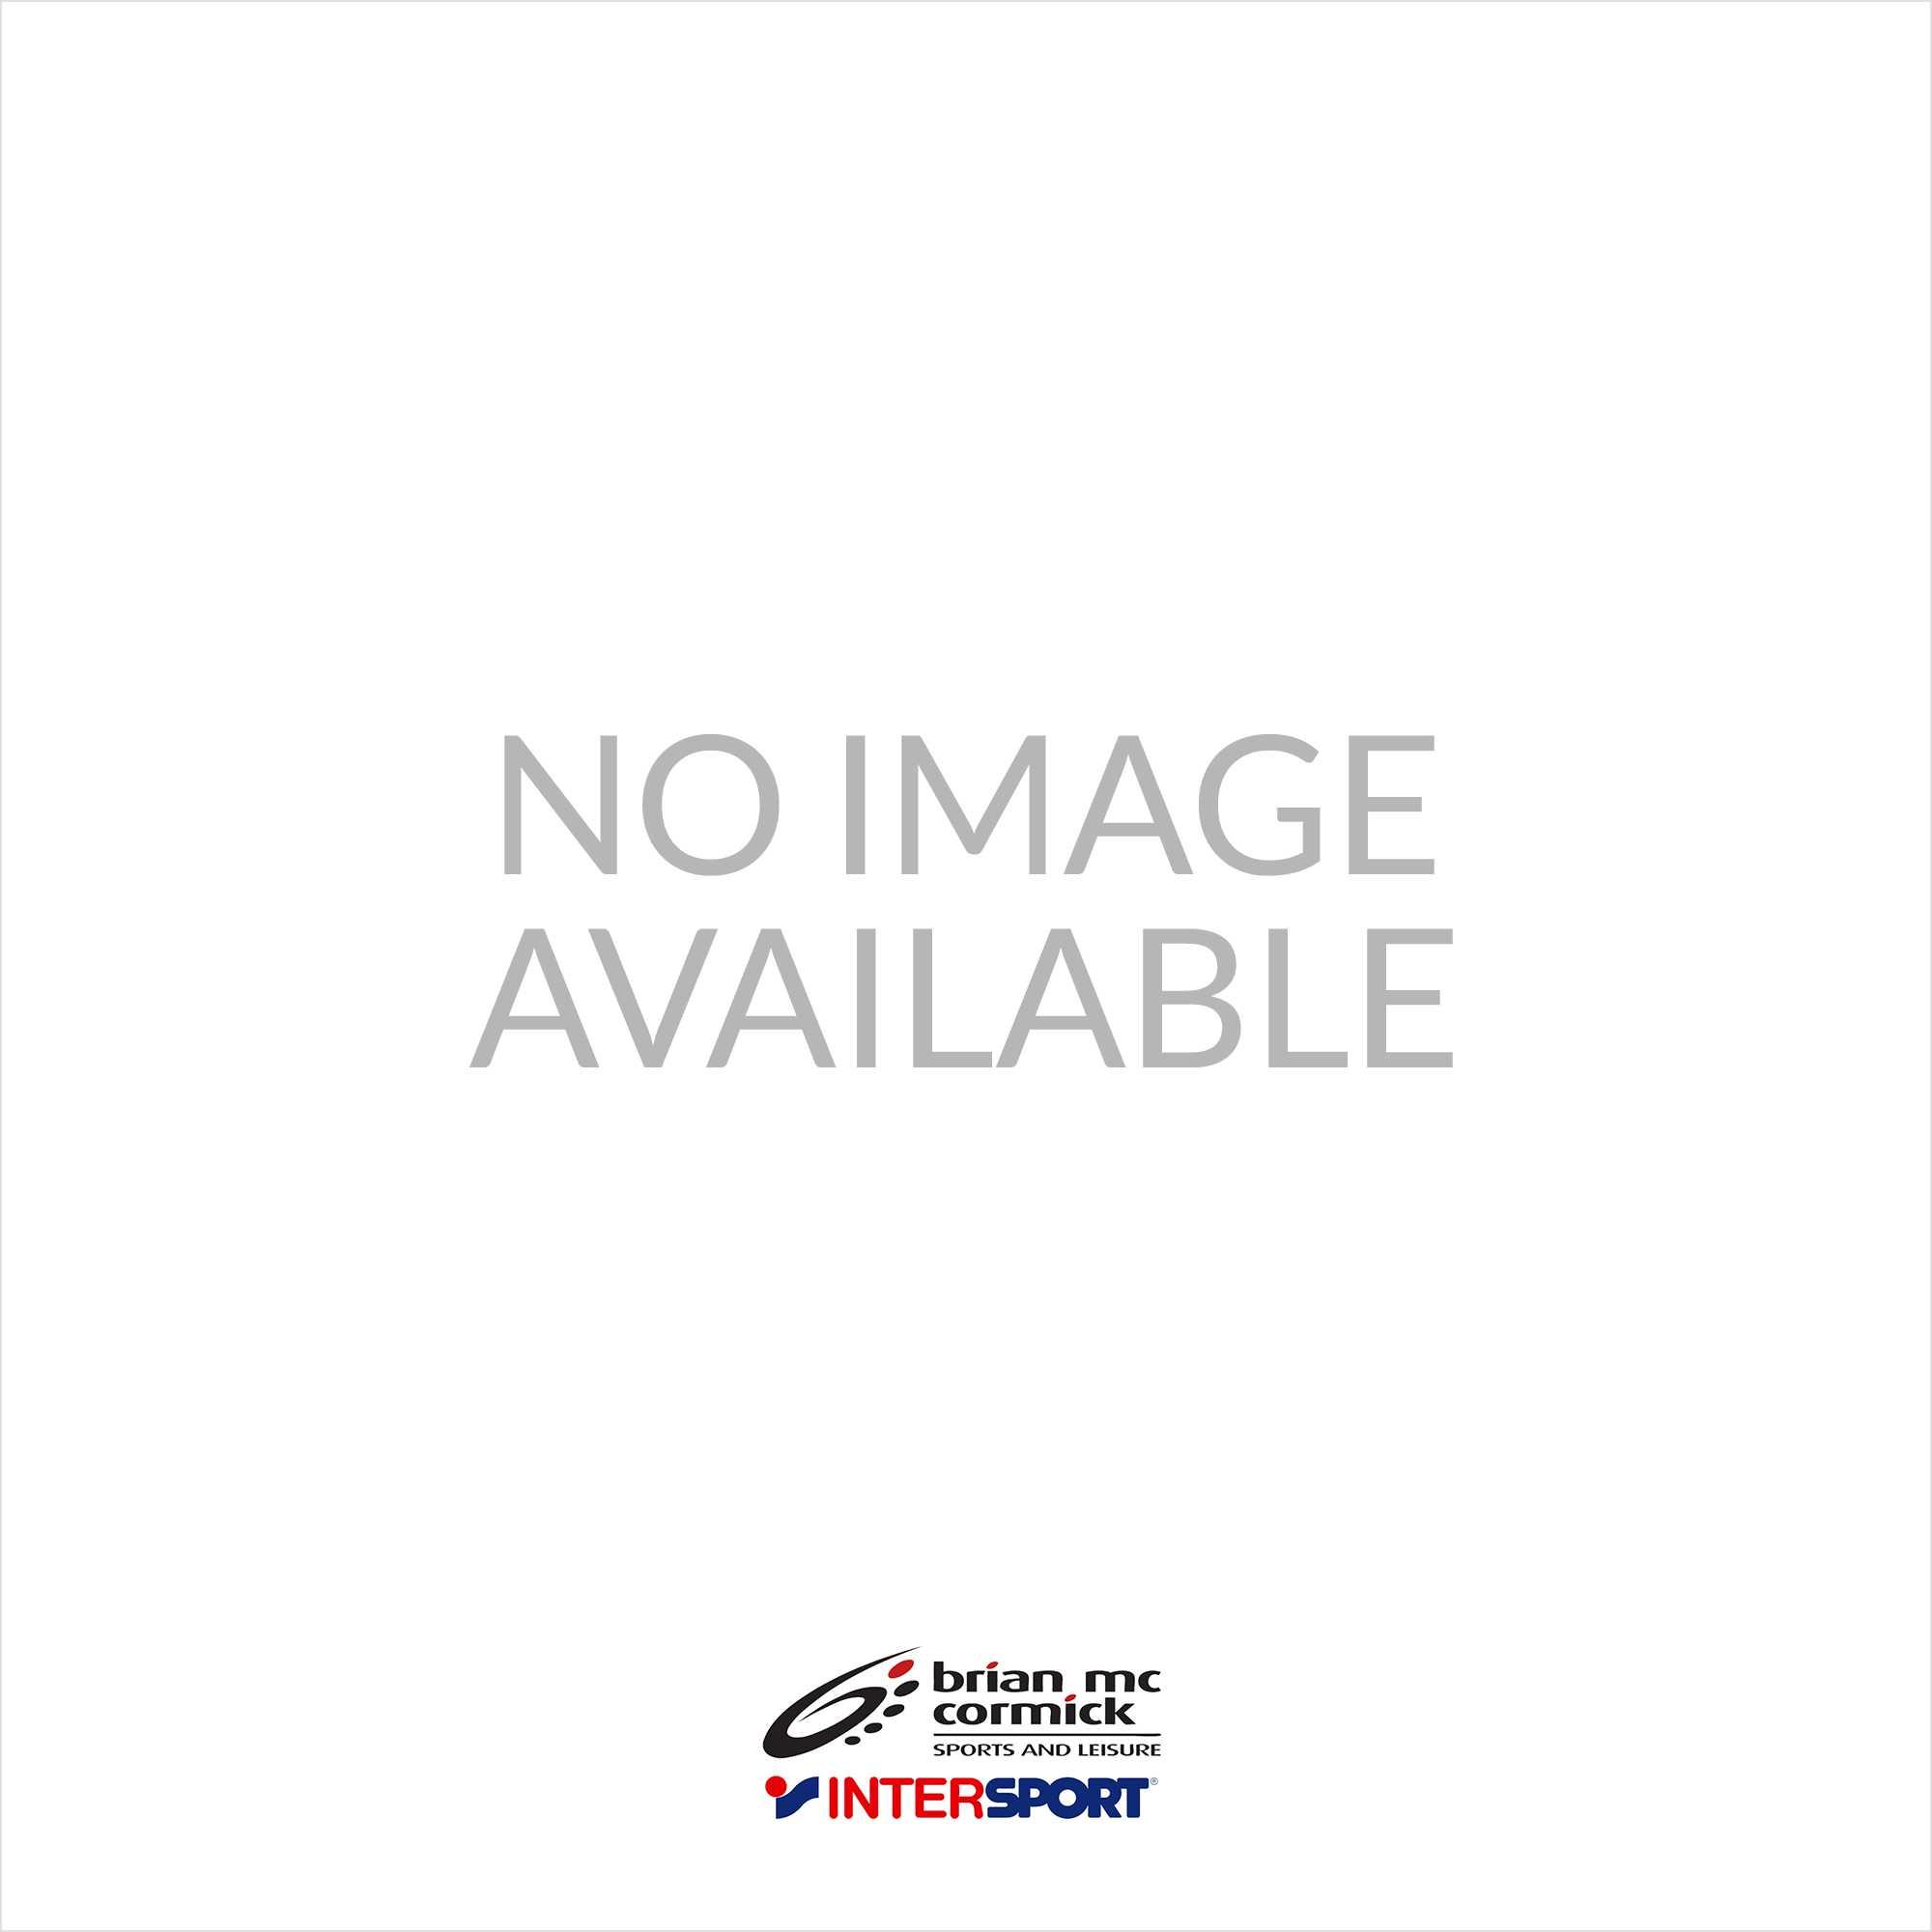 evitare caloria risciacquo  Puma King Pro Football Boots From €84.99